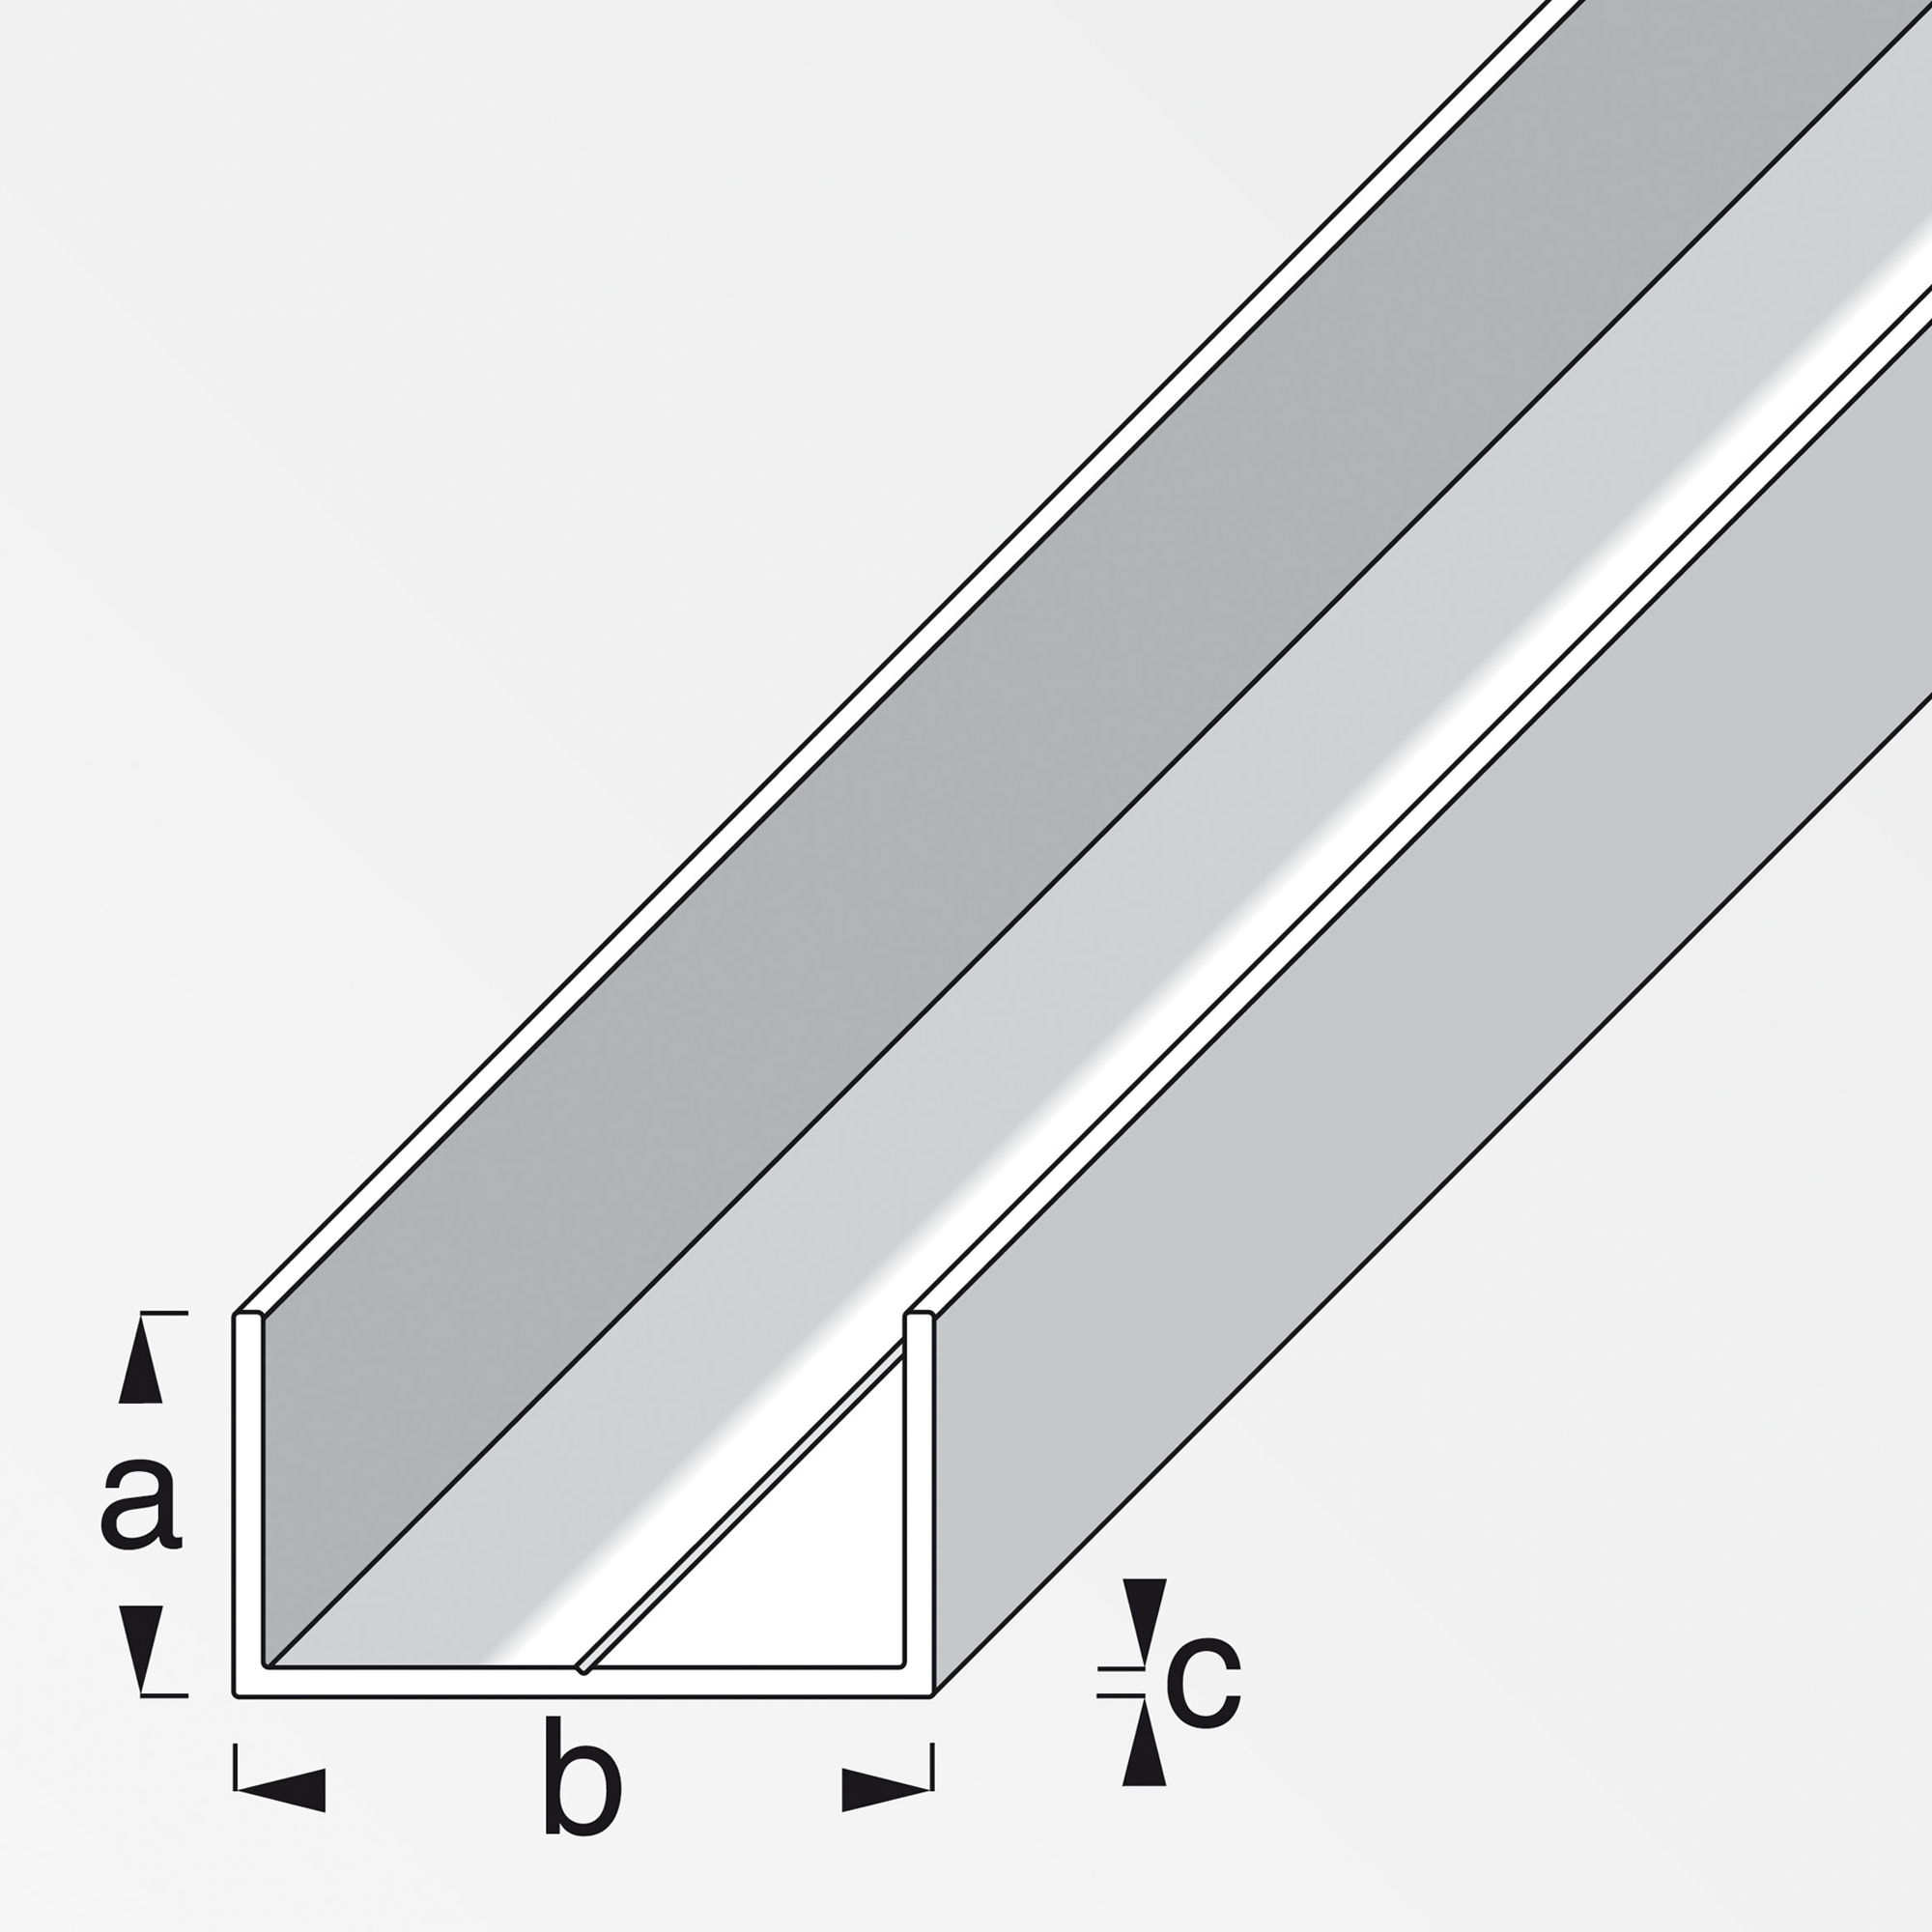 Alfer U-Profil rechteckig weiß 100 x 2,75 x 1,55 cm ǀ toom